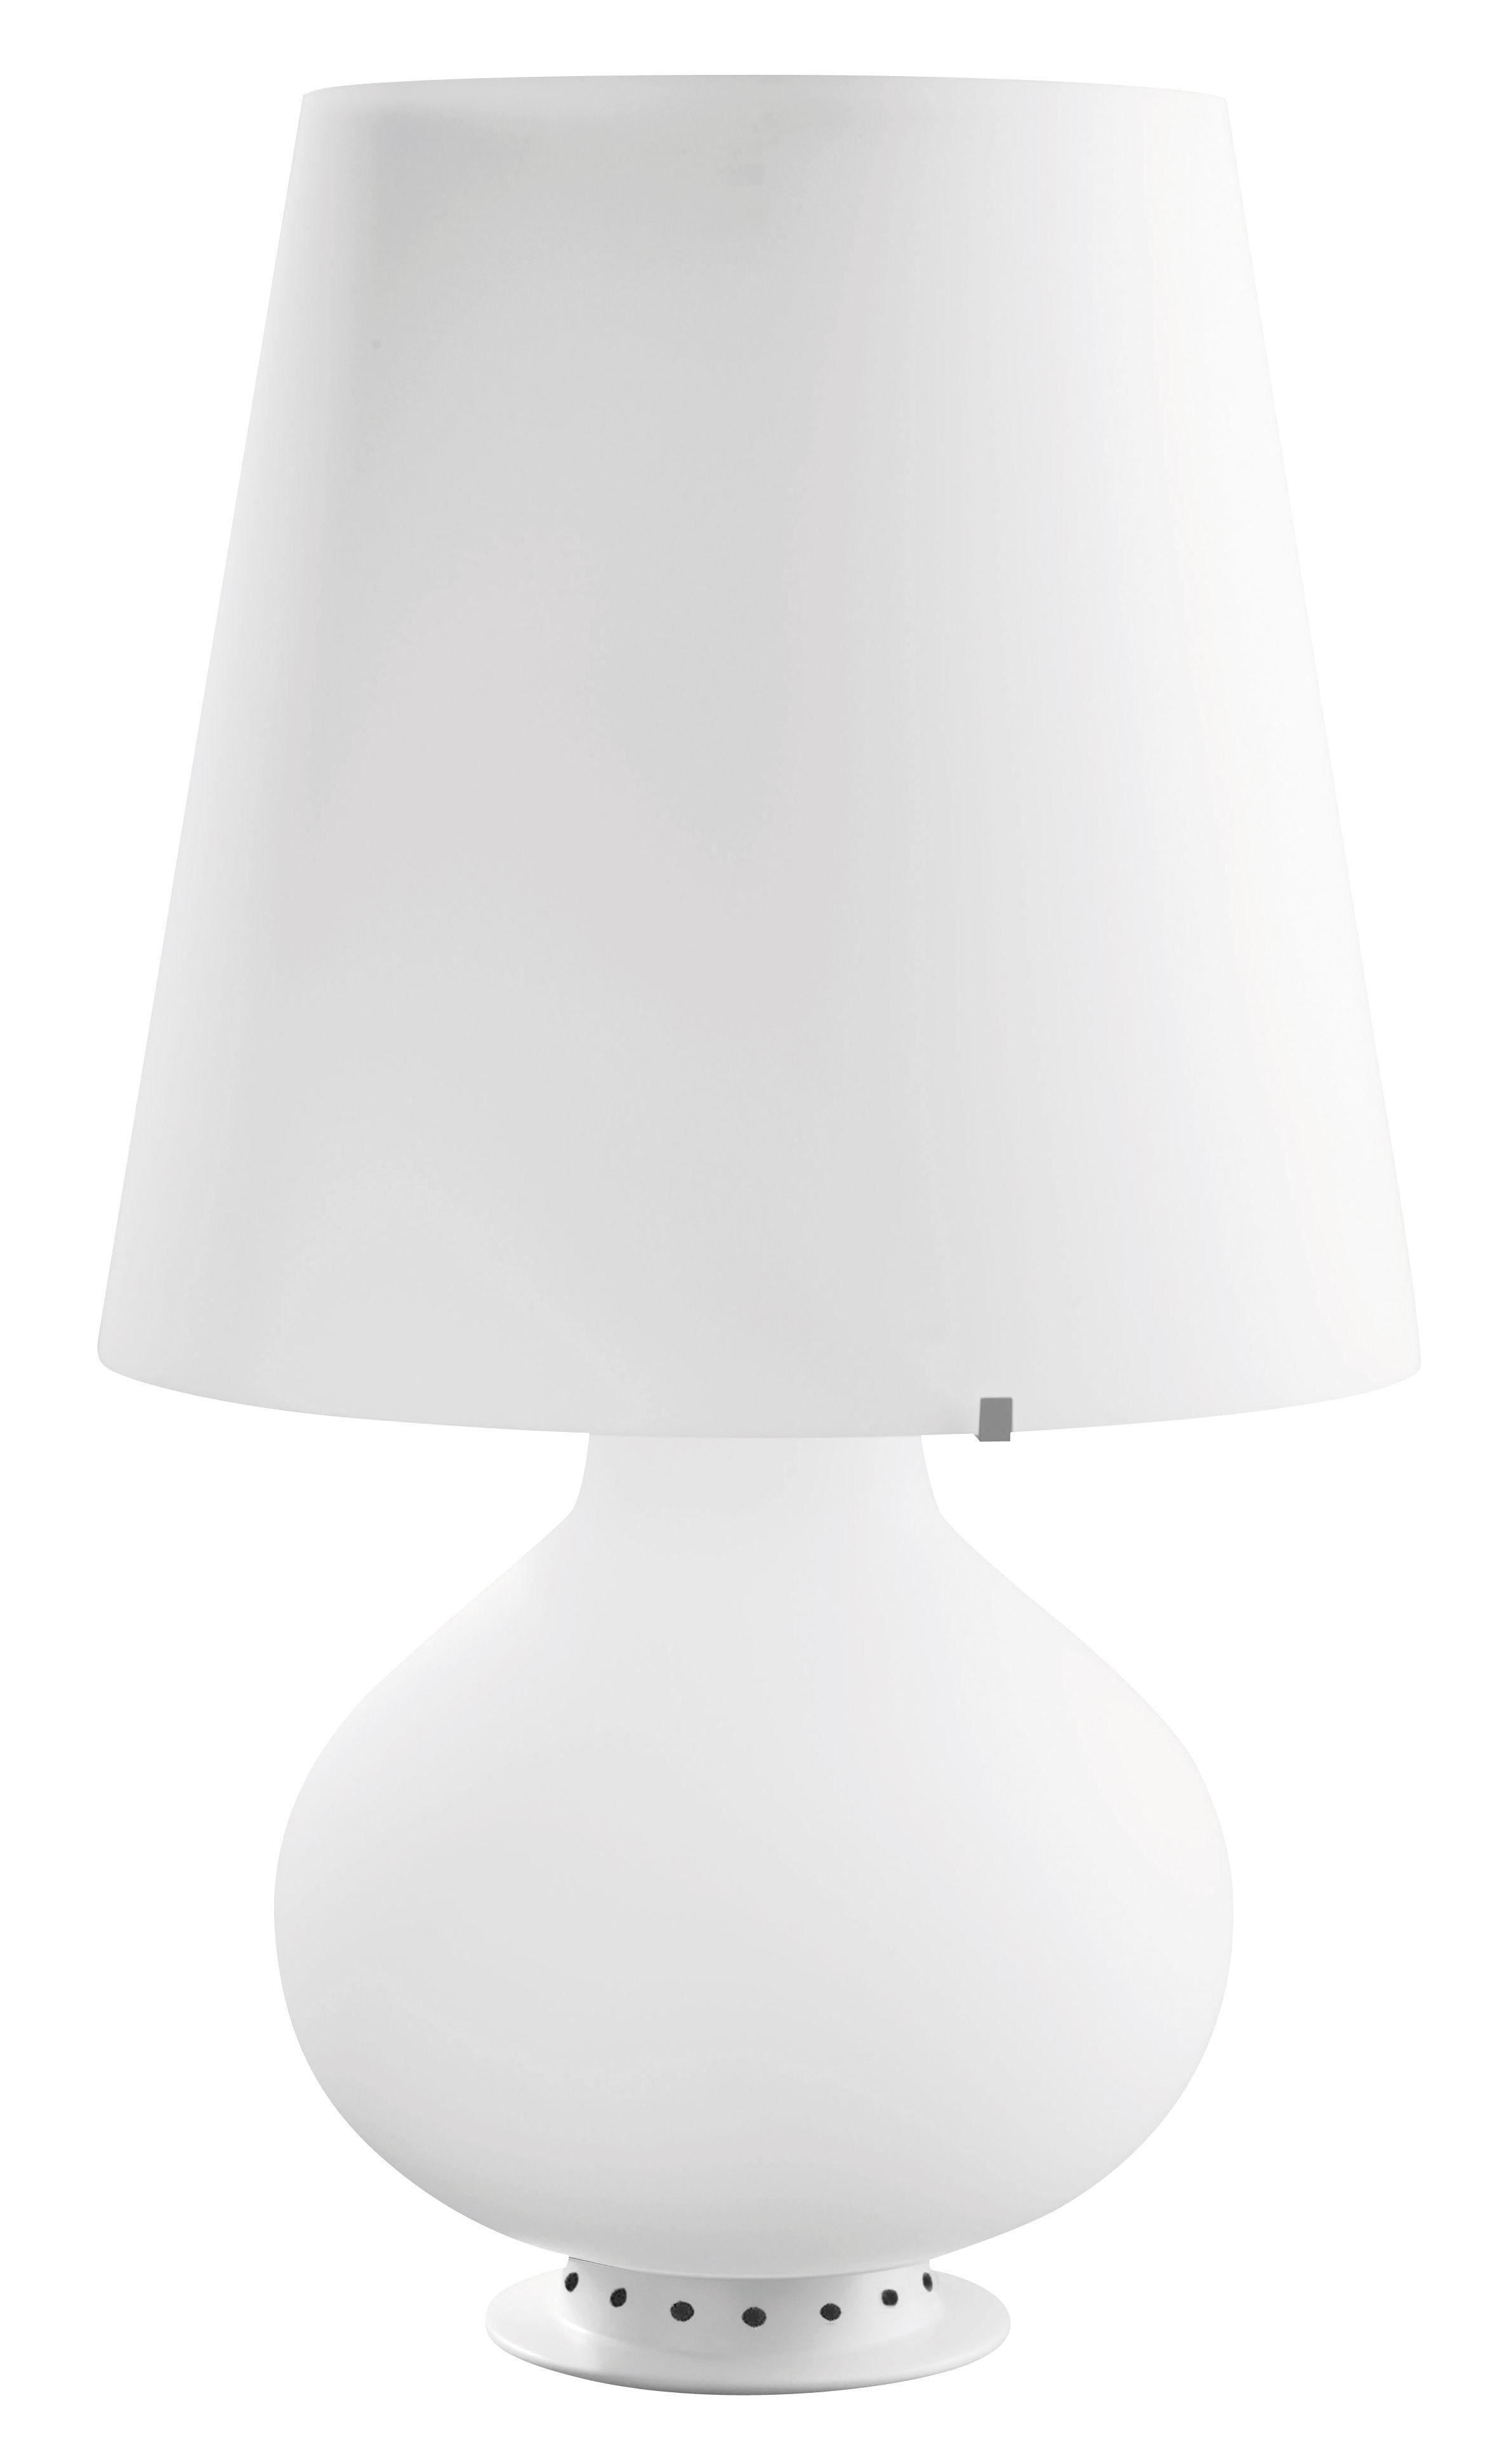 Leuchten - Tischleuchten - Fontana Lampe - Fontana Arte - H 78 cm - geblasenes Glas, Metall